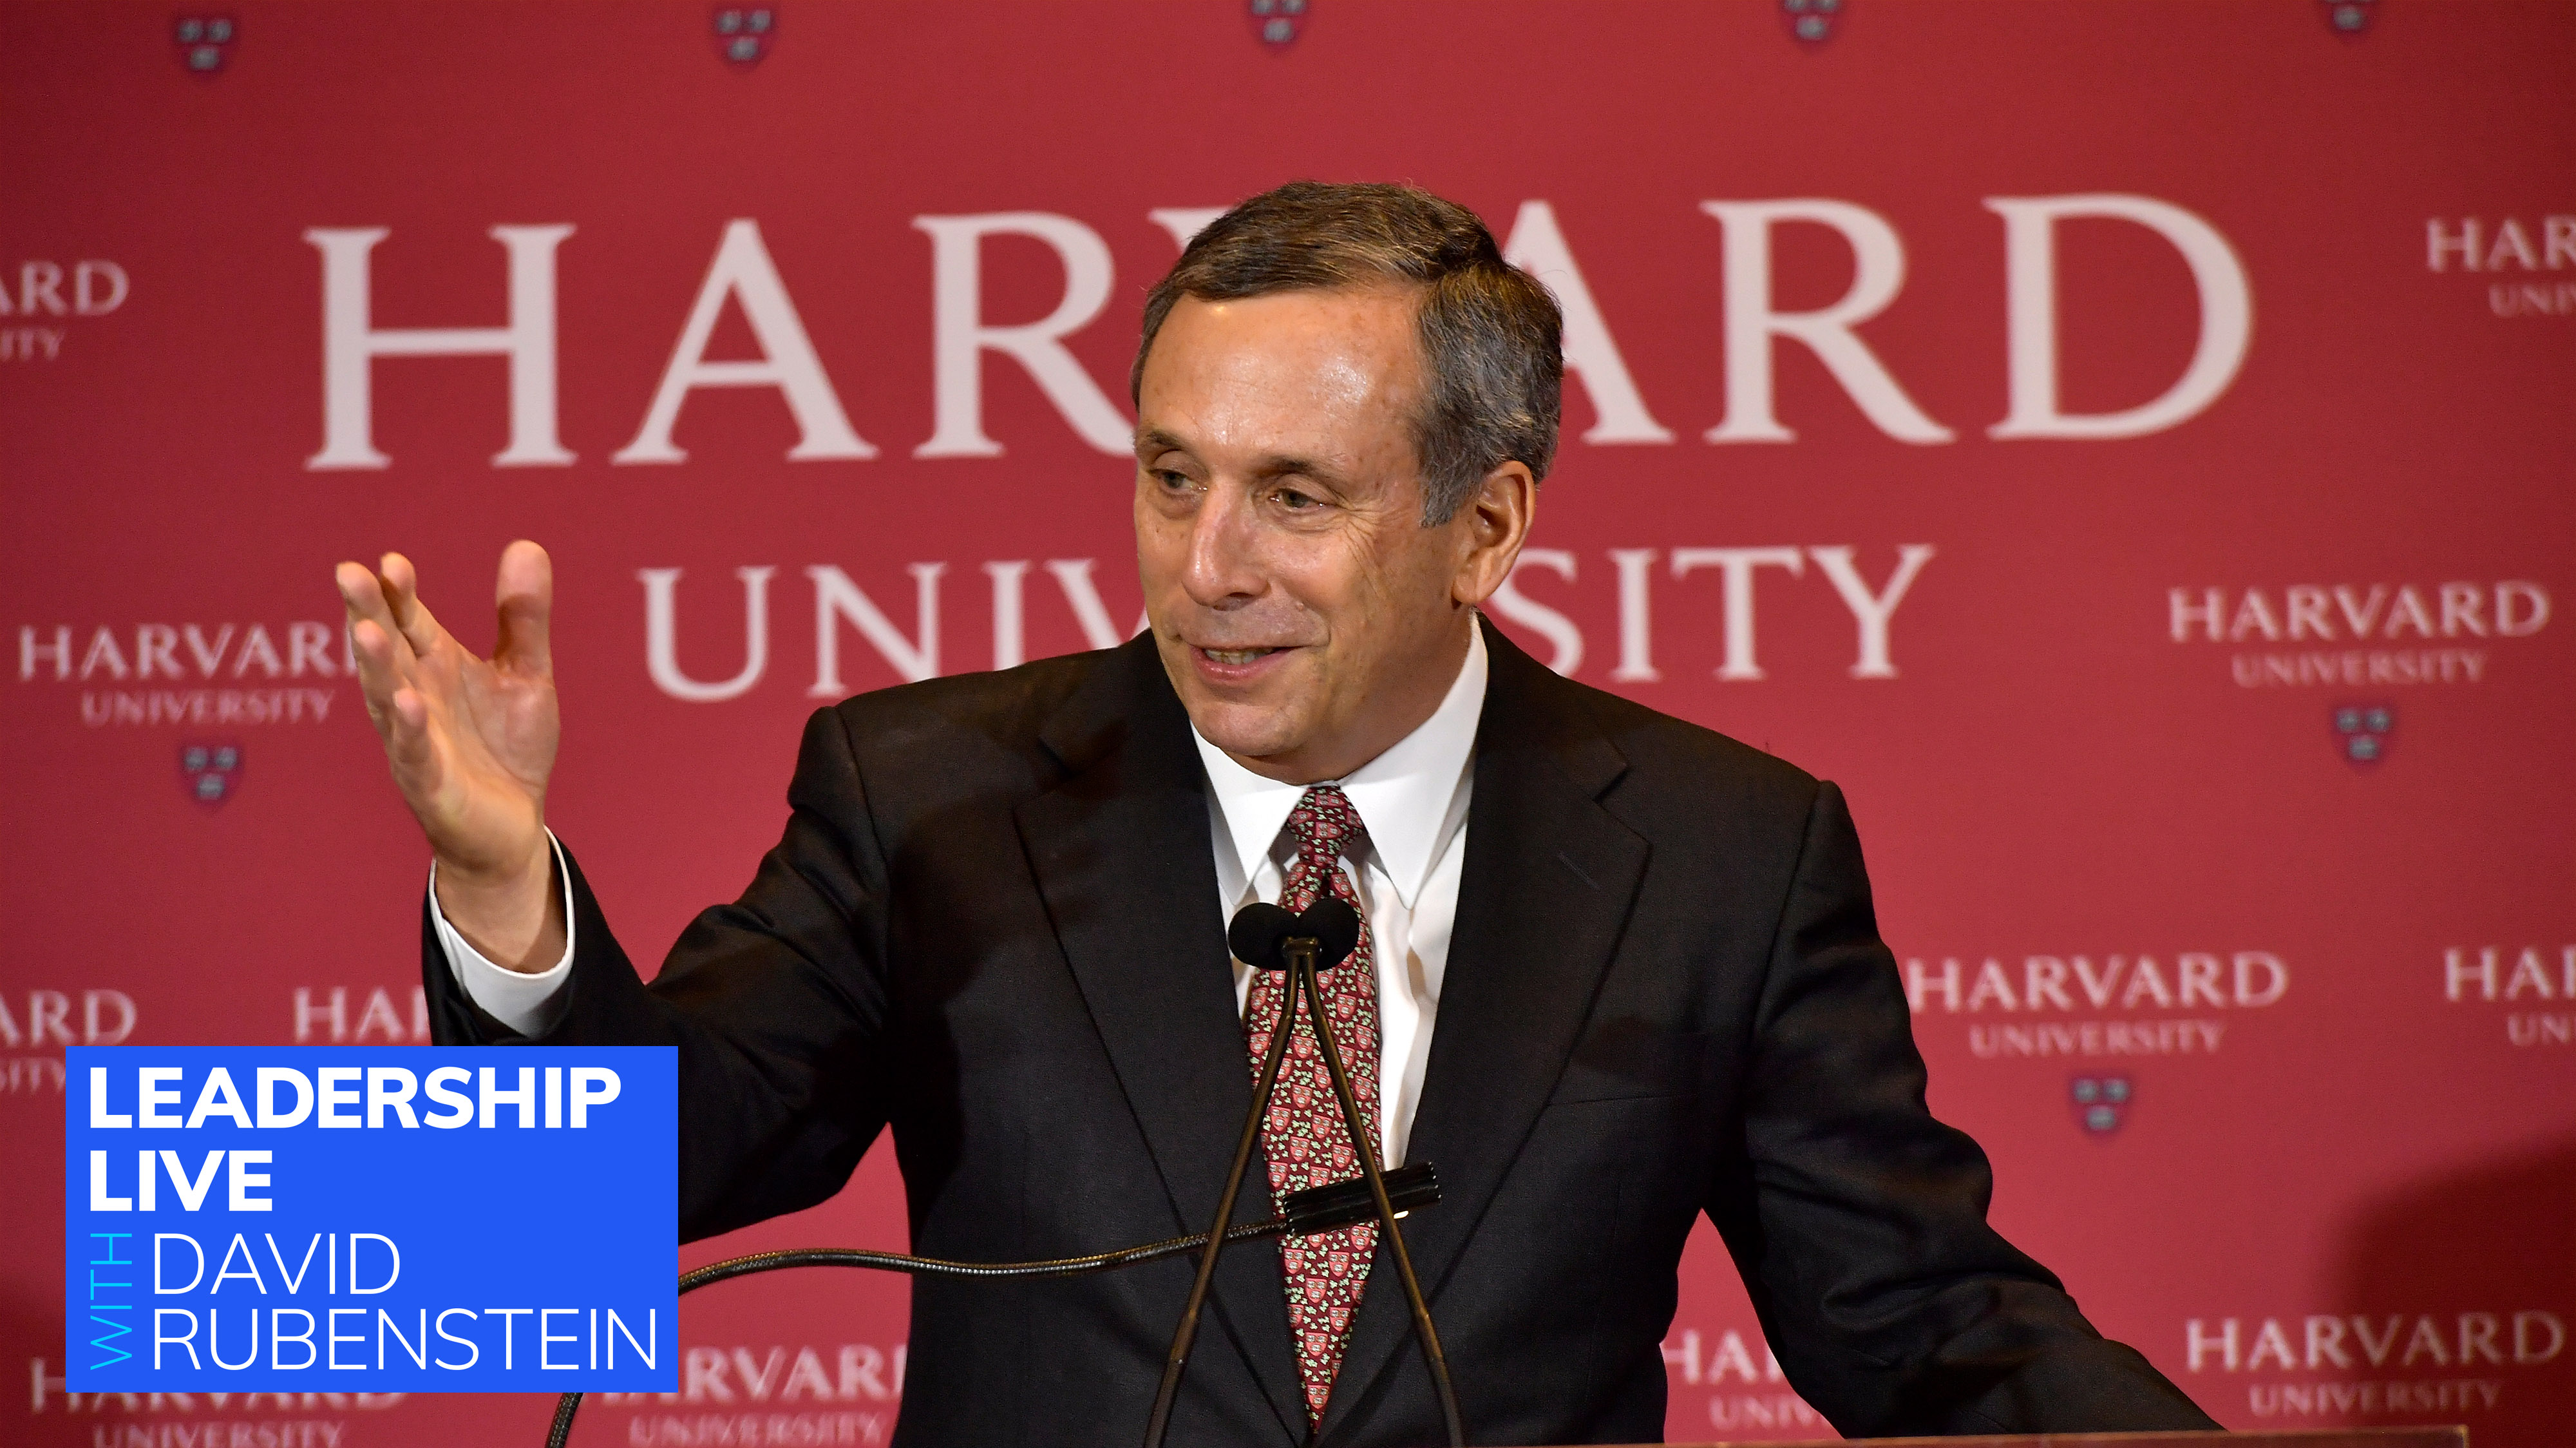 Leadership Live With David Rubenstein: Harvard President Lawrenc Bacow